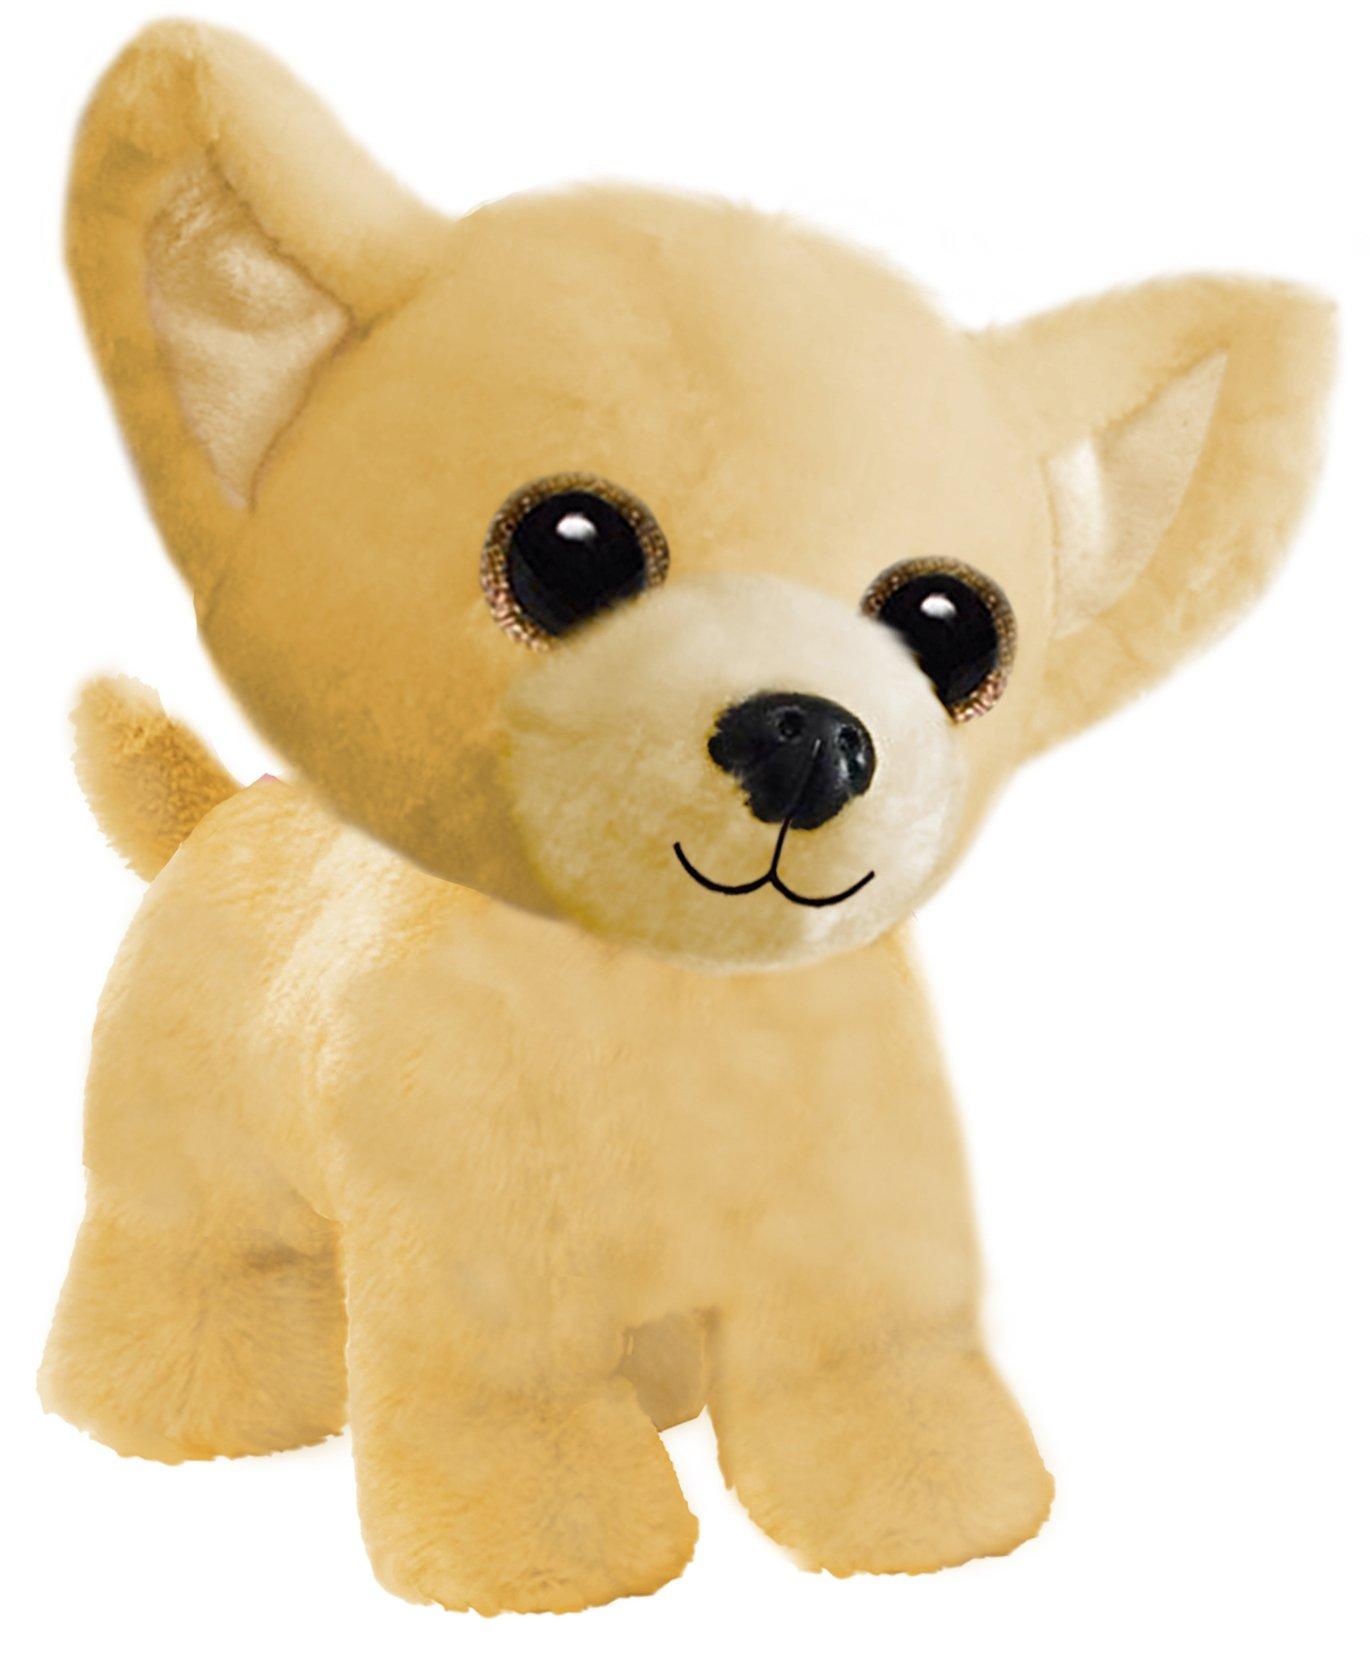 "First & Main 7"" Tan Wuffles Chihuahua Puppy Dog Basic Plush Toys"